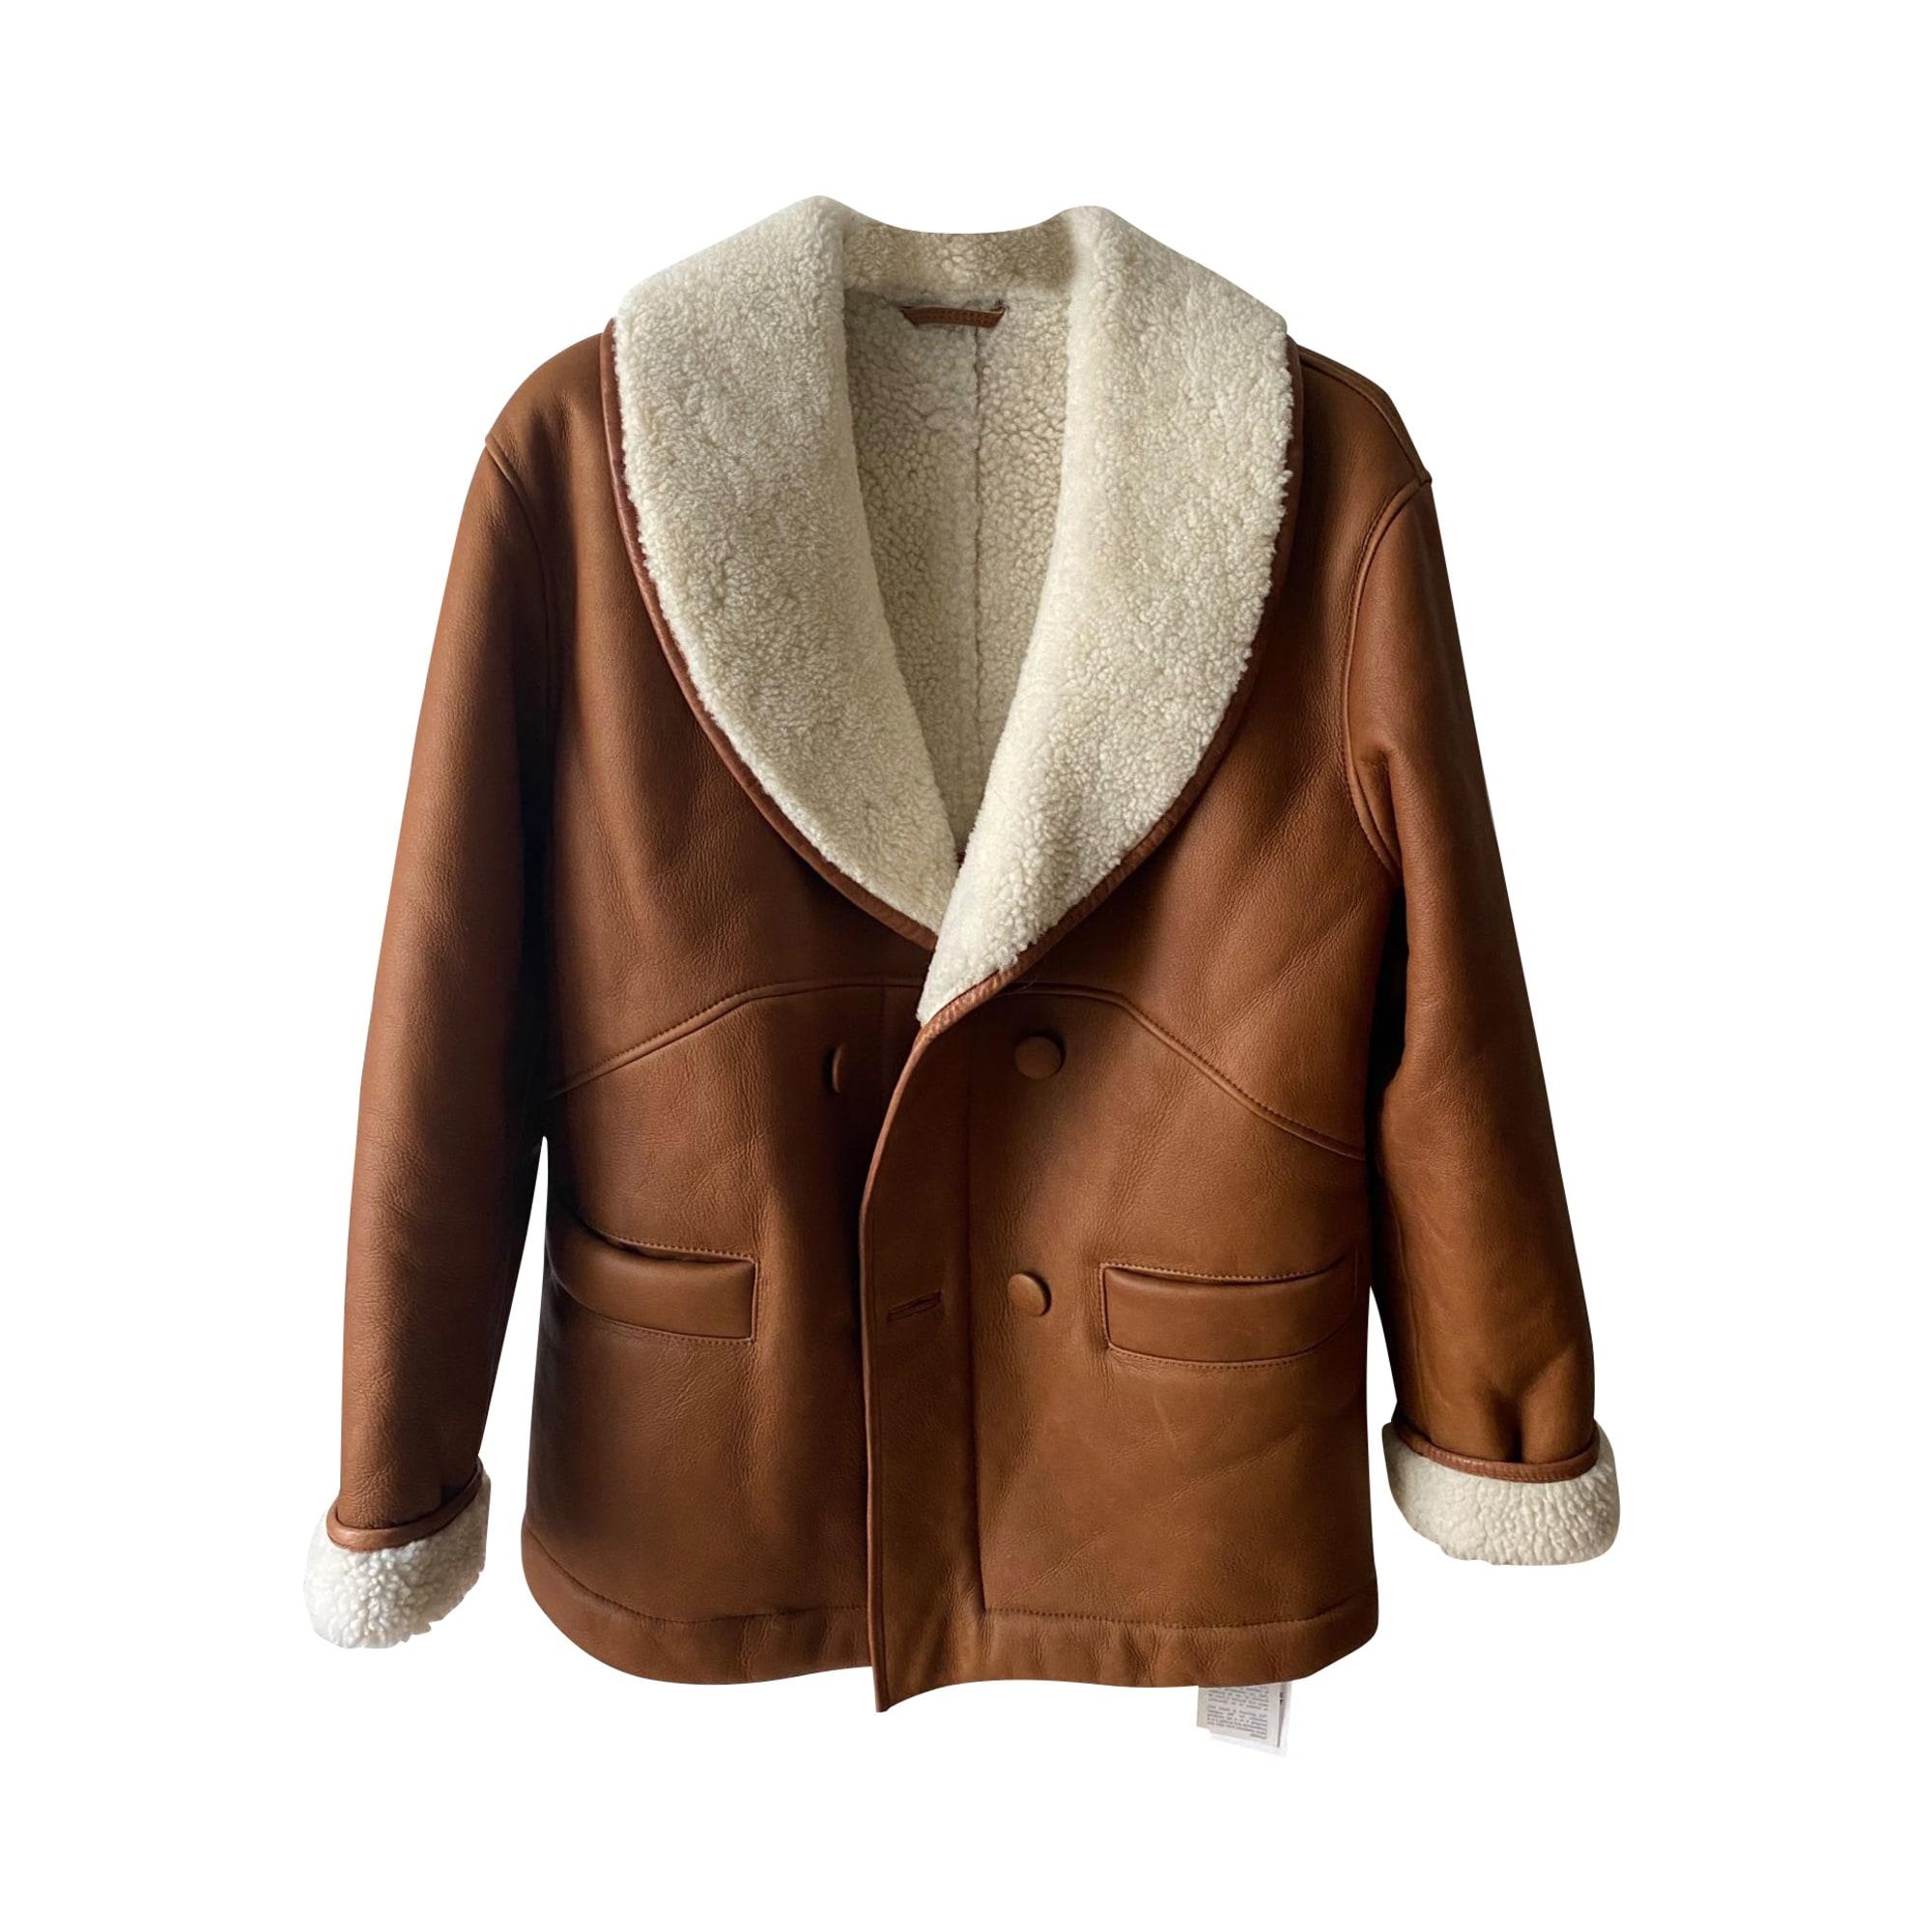 Leather Coat CLAUDIE PIERLOT Beige, camel